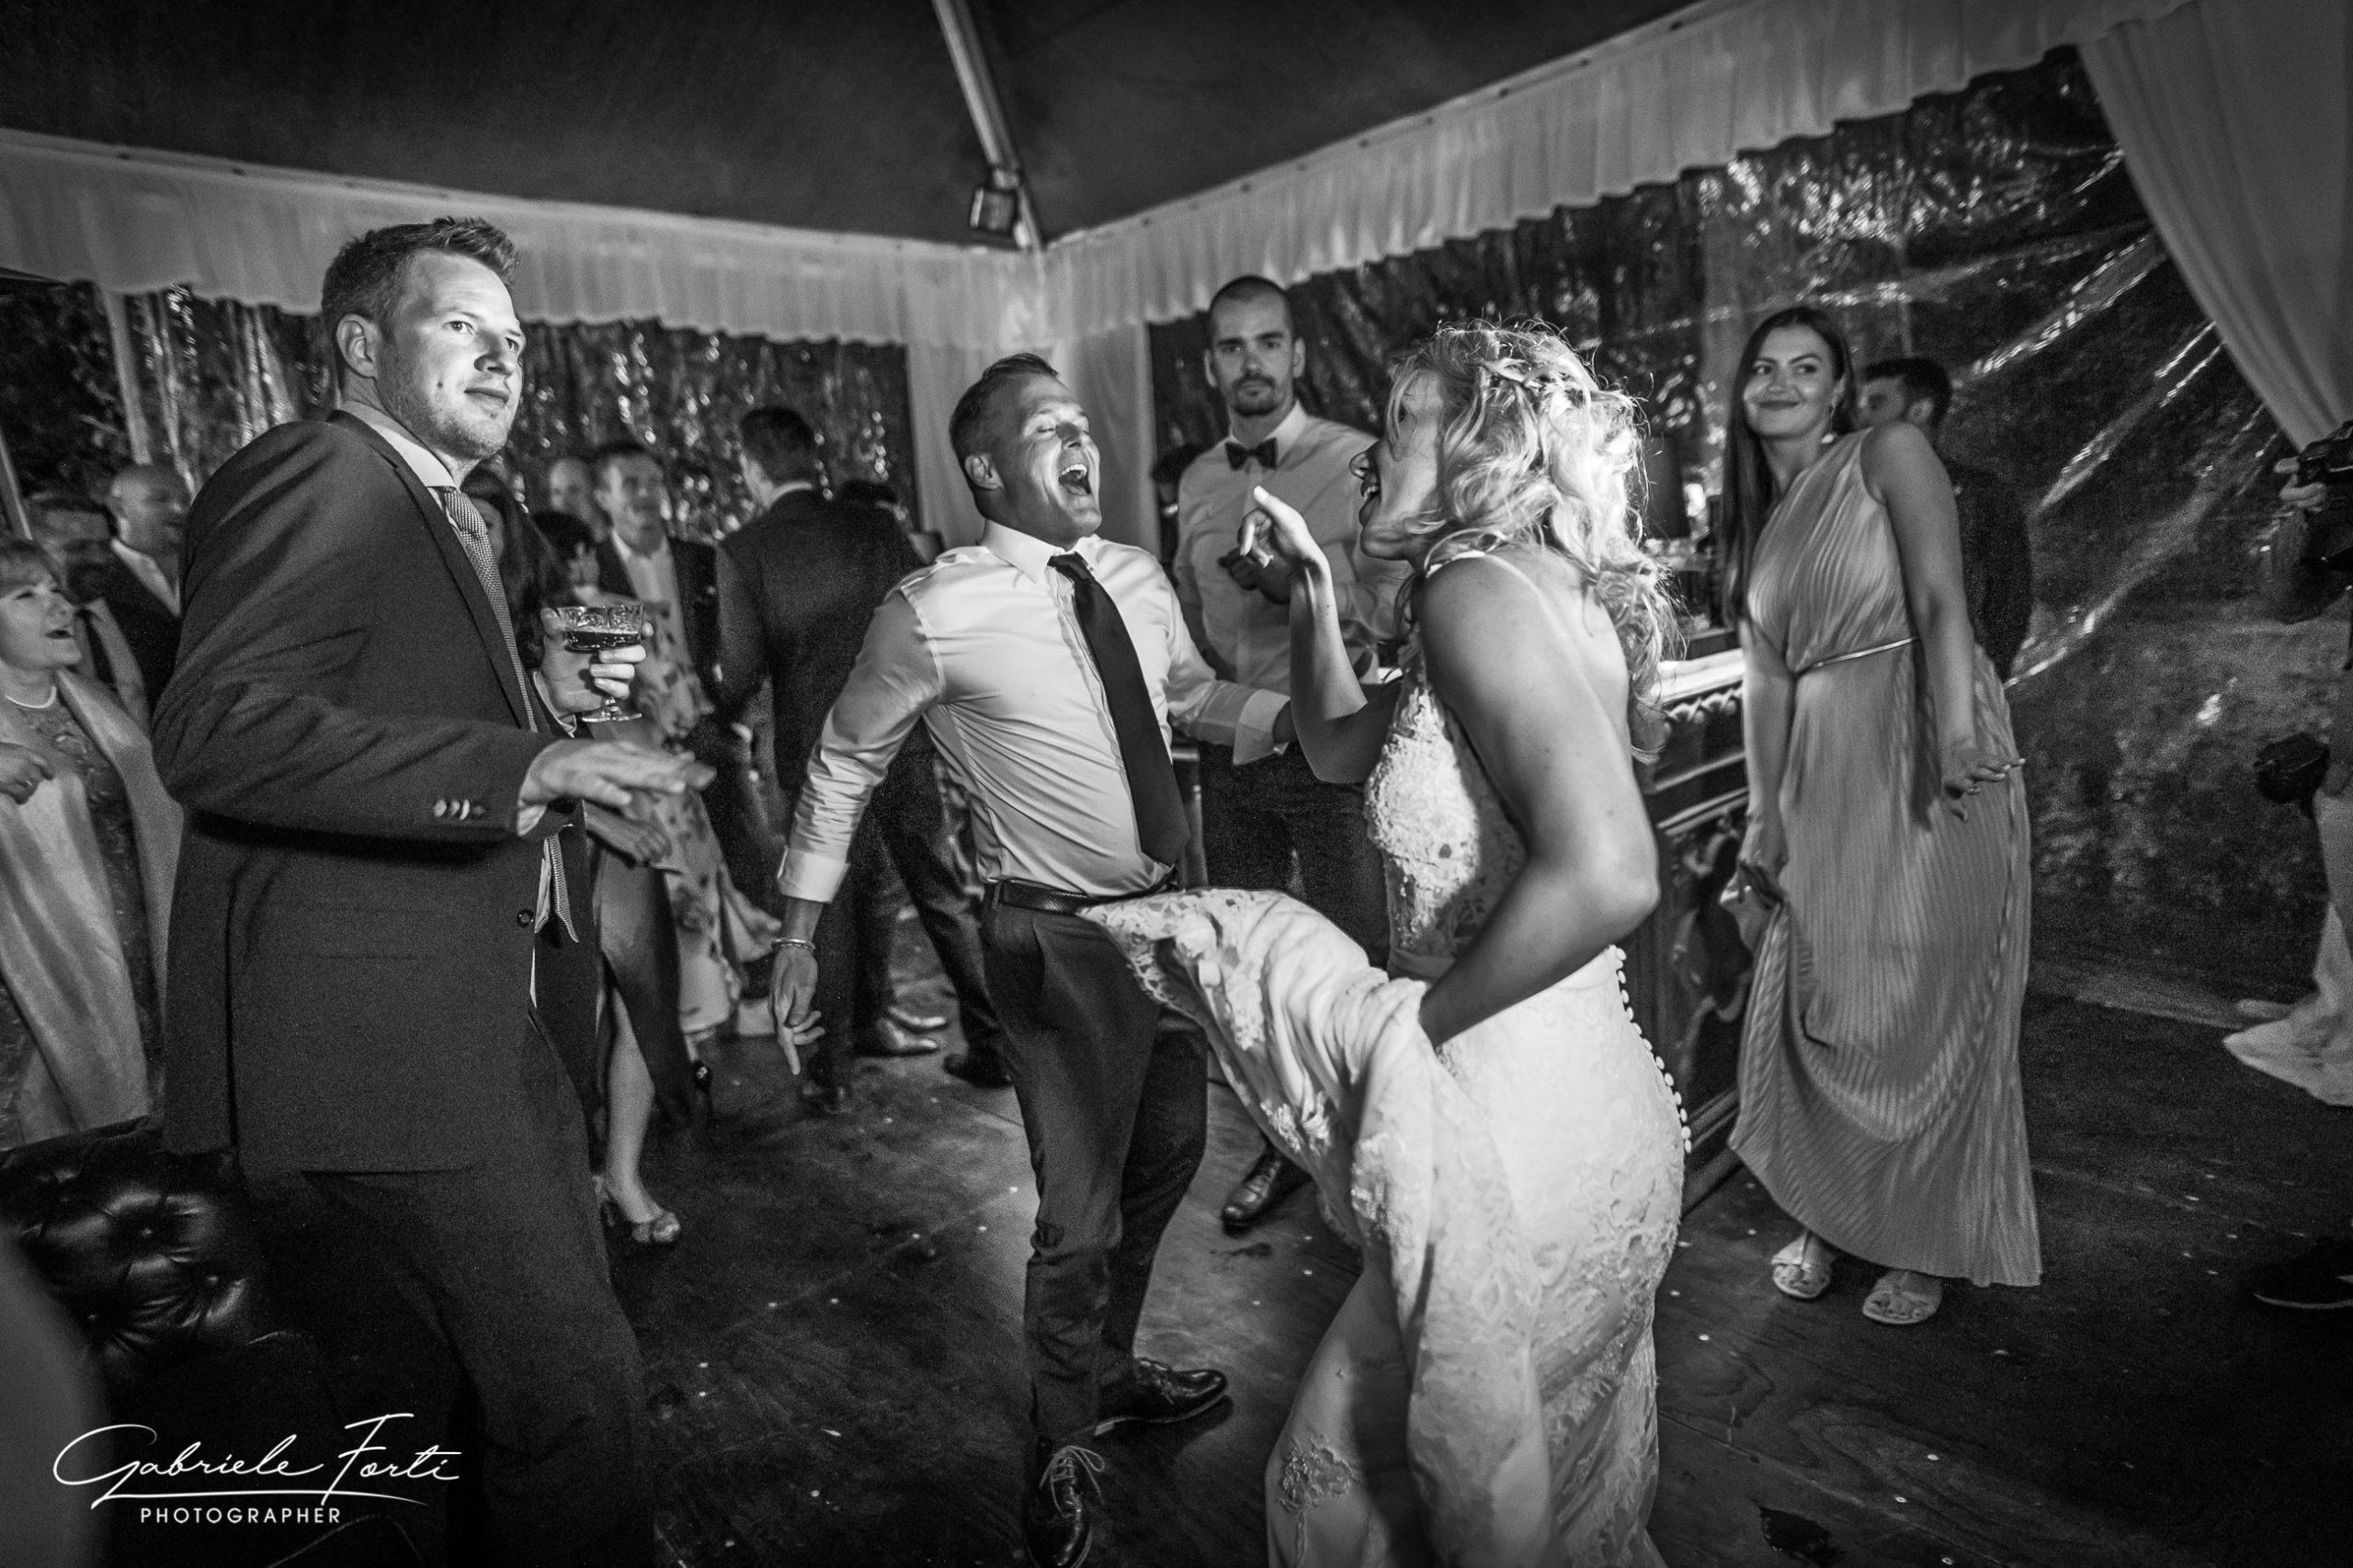 wedding-cortona-tuscany-italy-photographer-foto-forti-gabriele-villa-laura-11